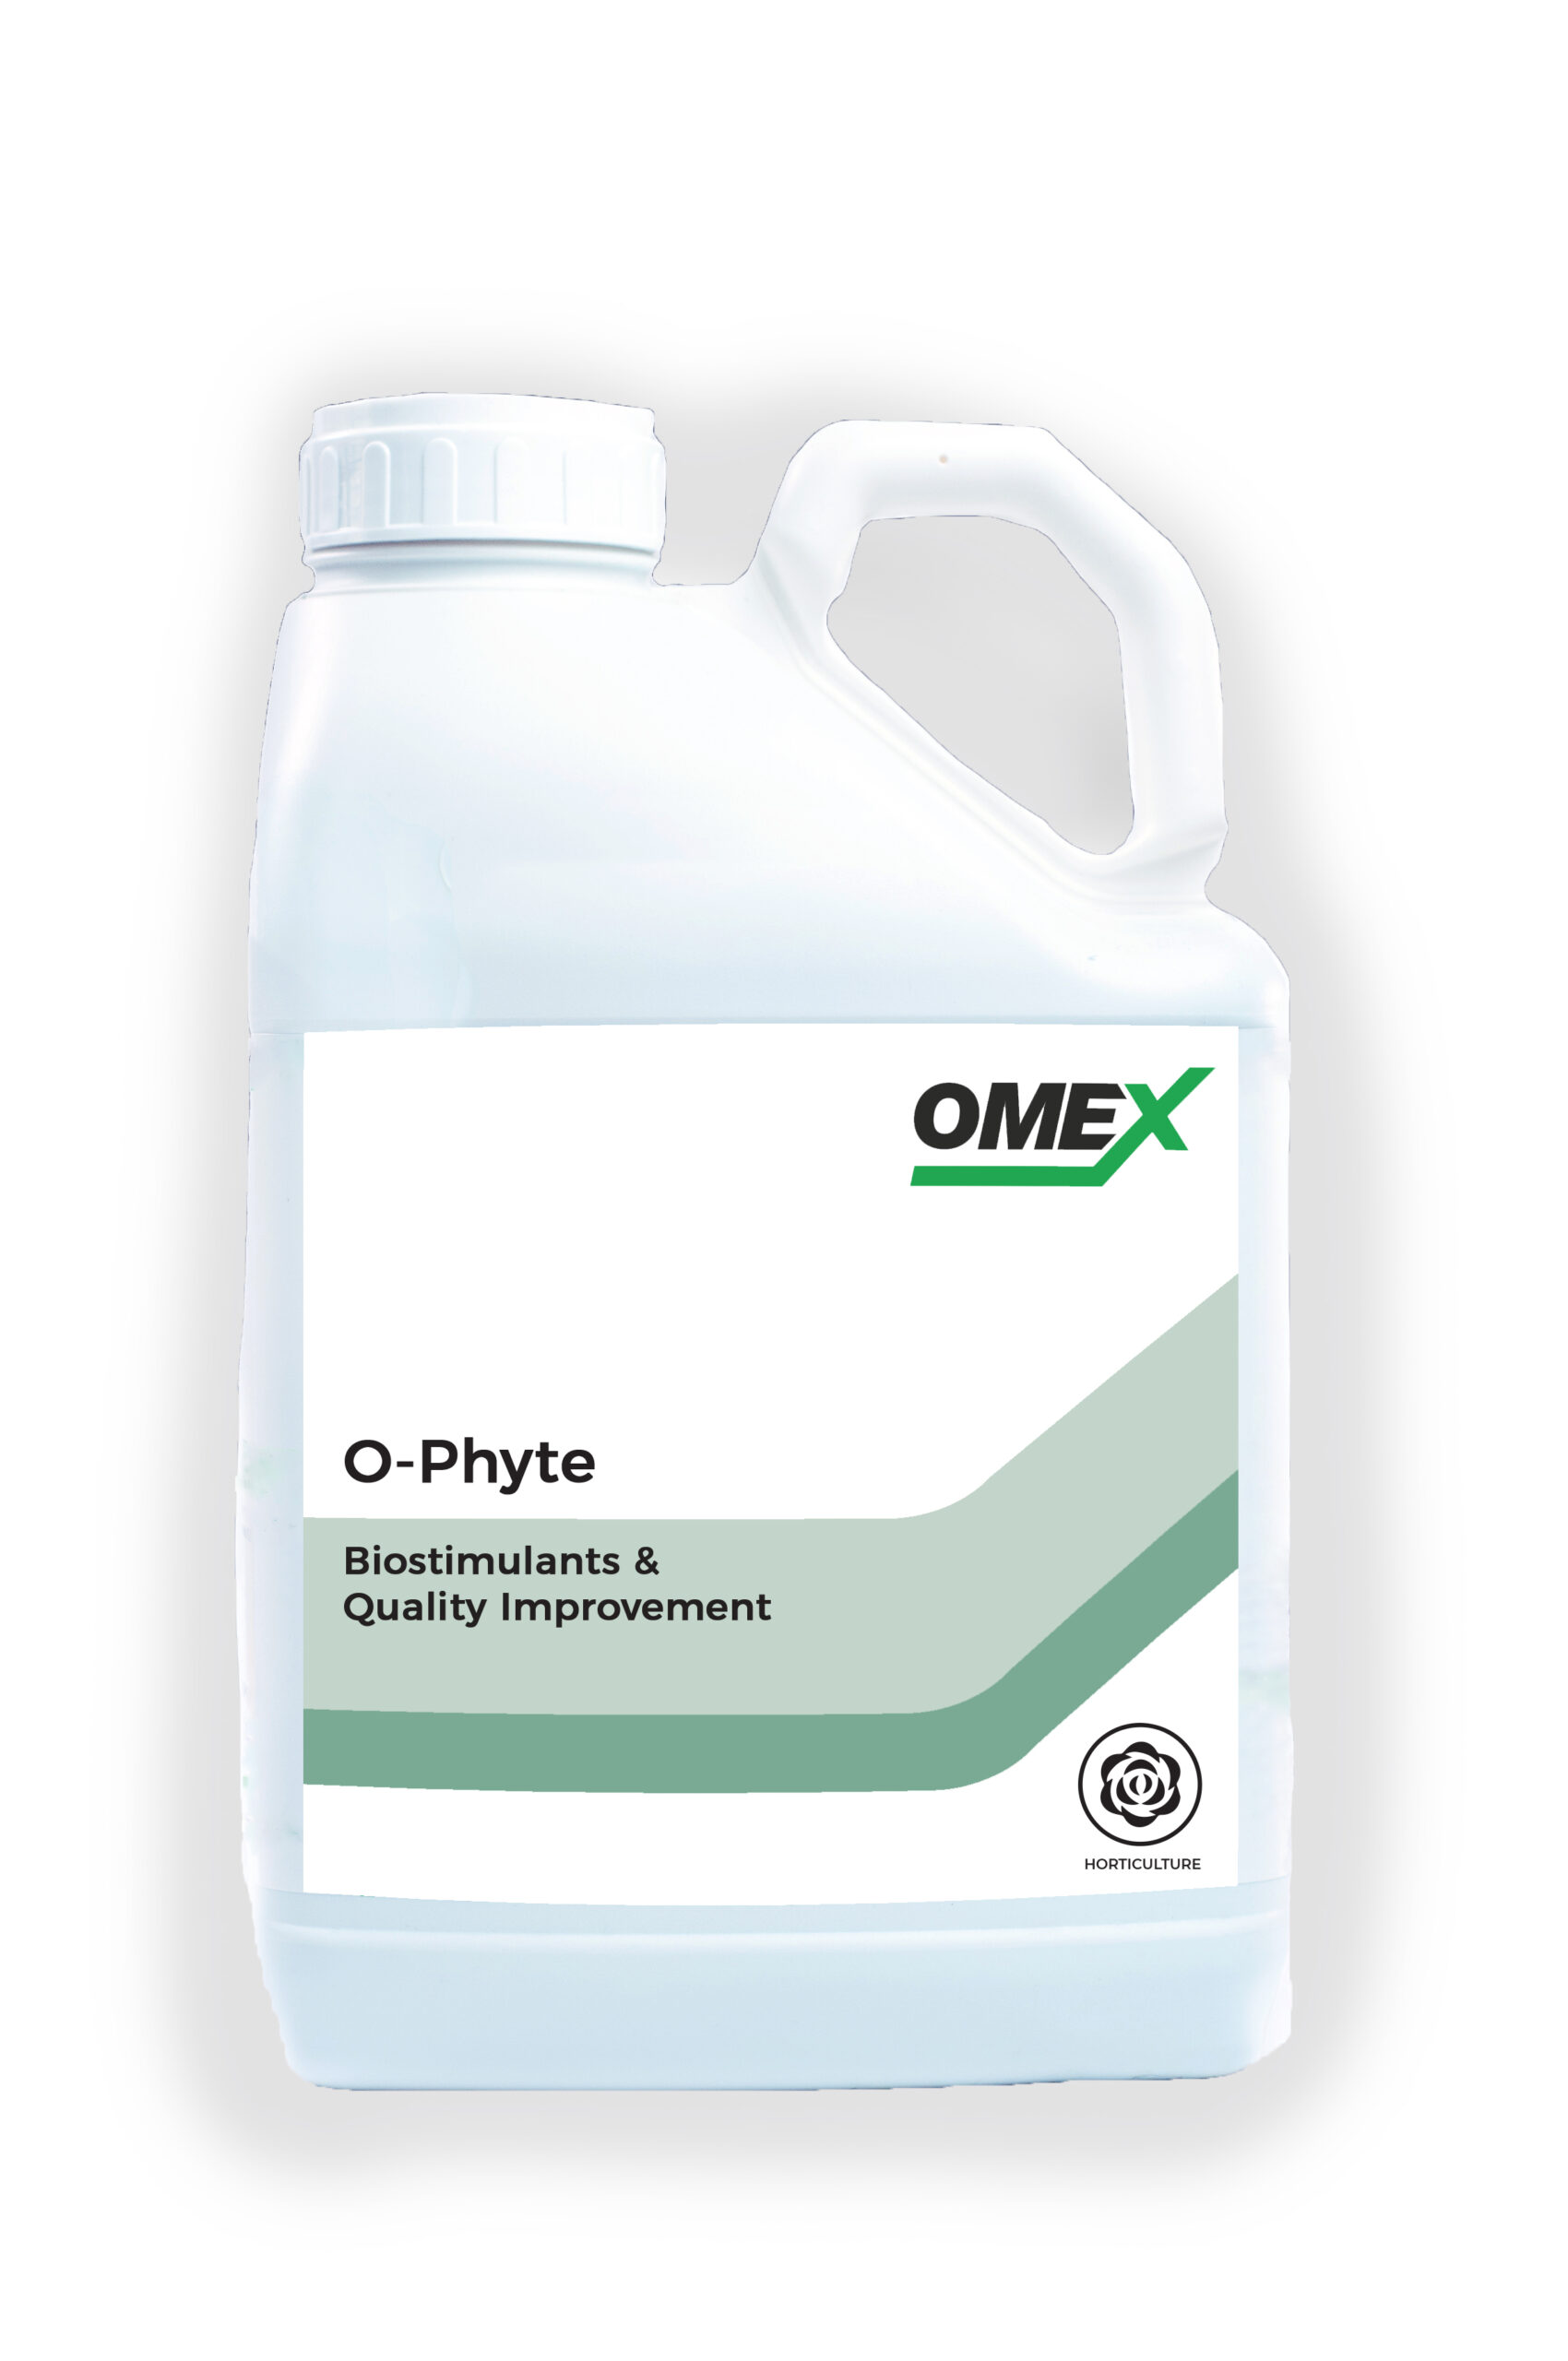 O-Phyte